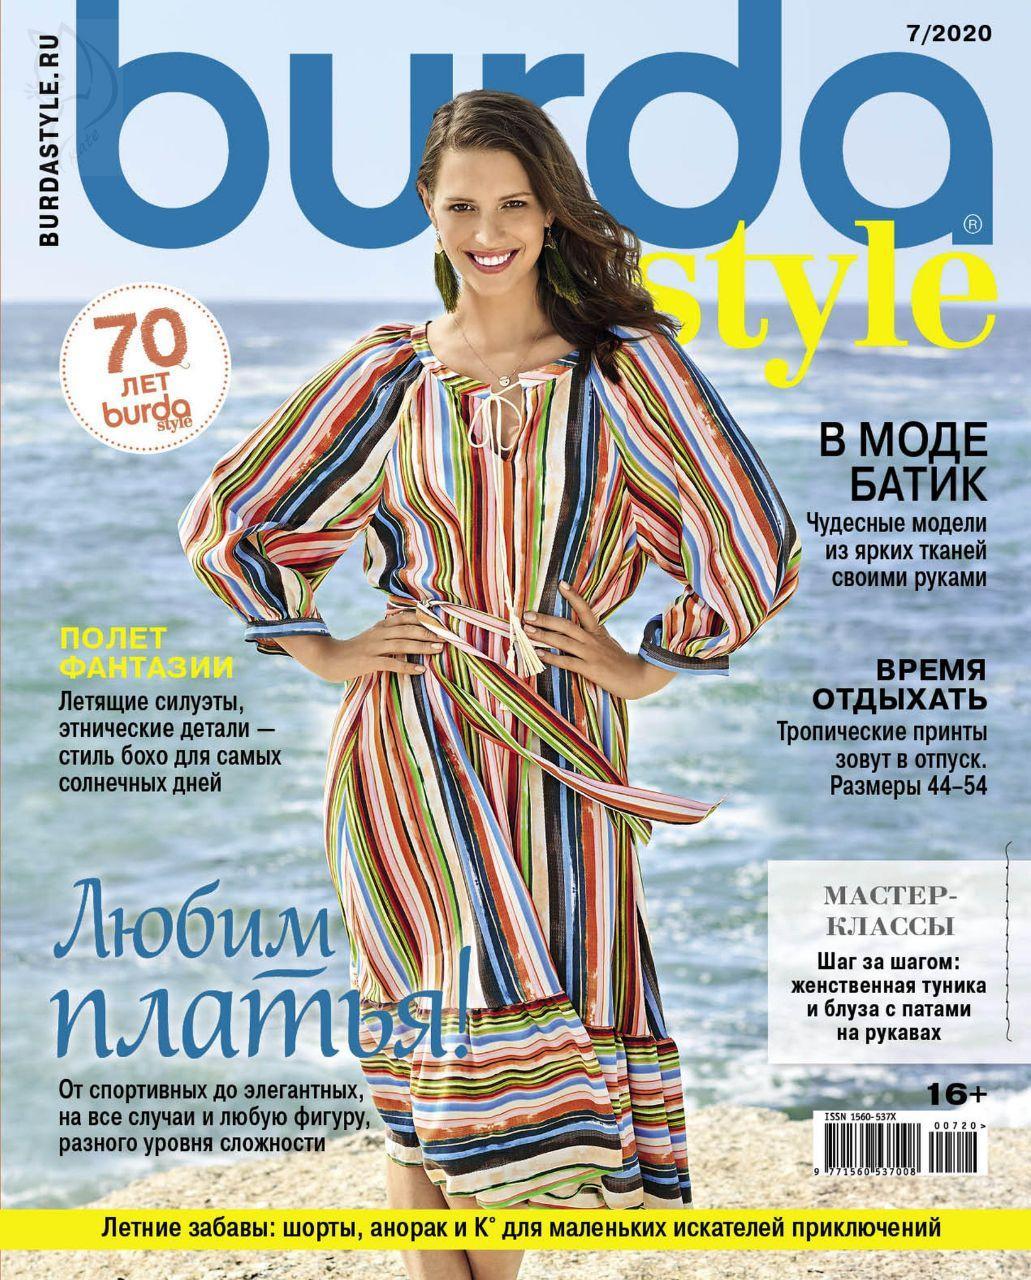 مجله بوردا